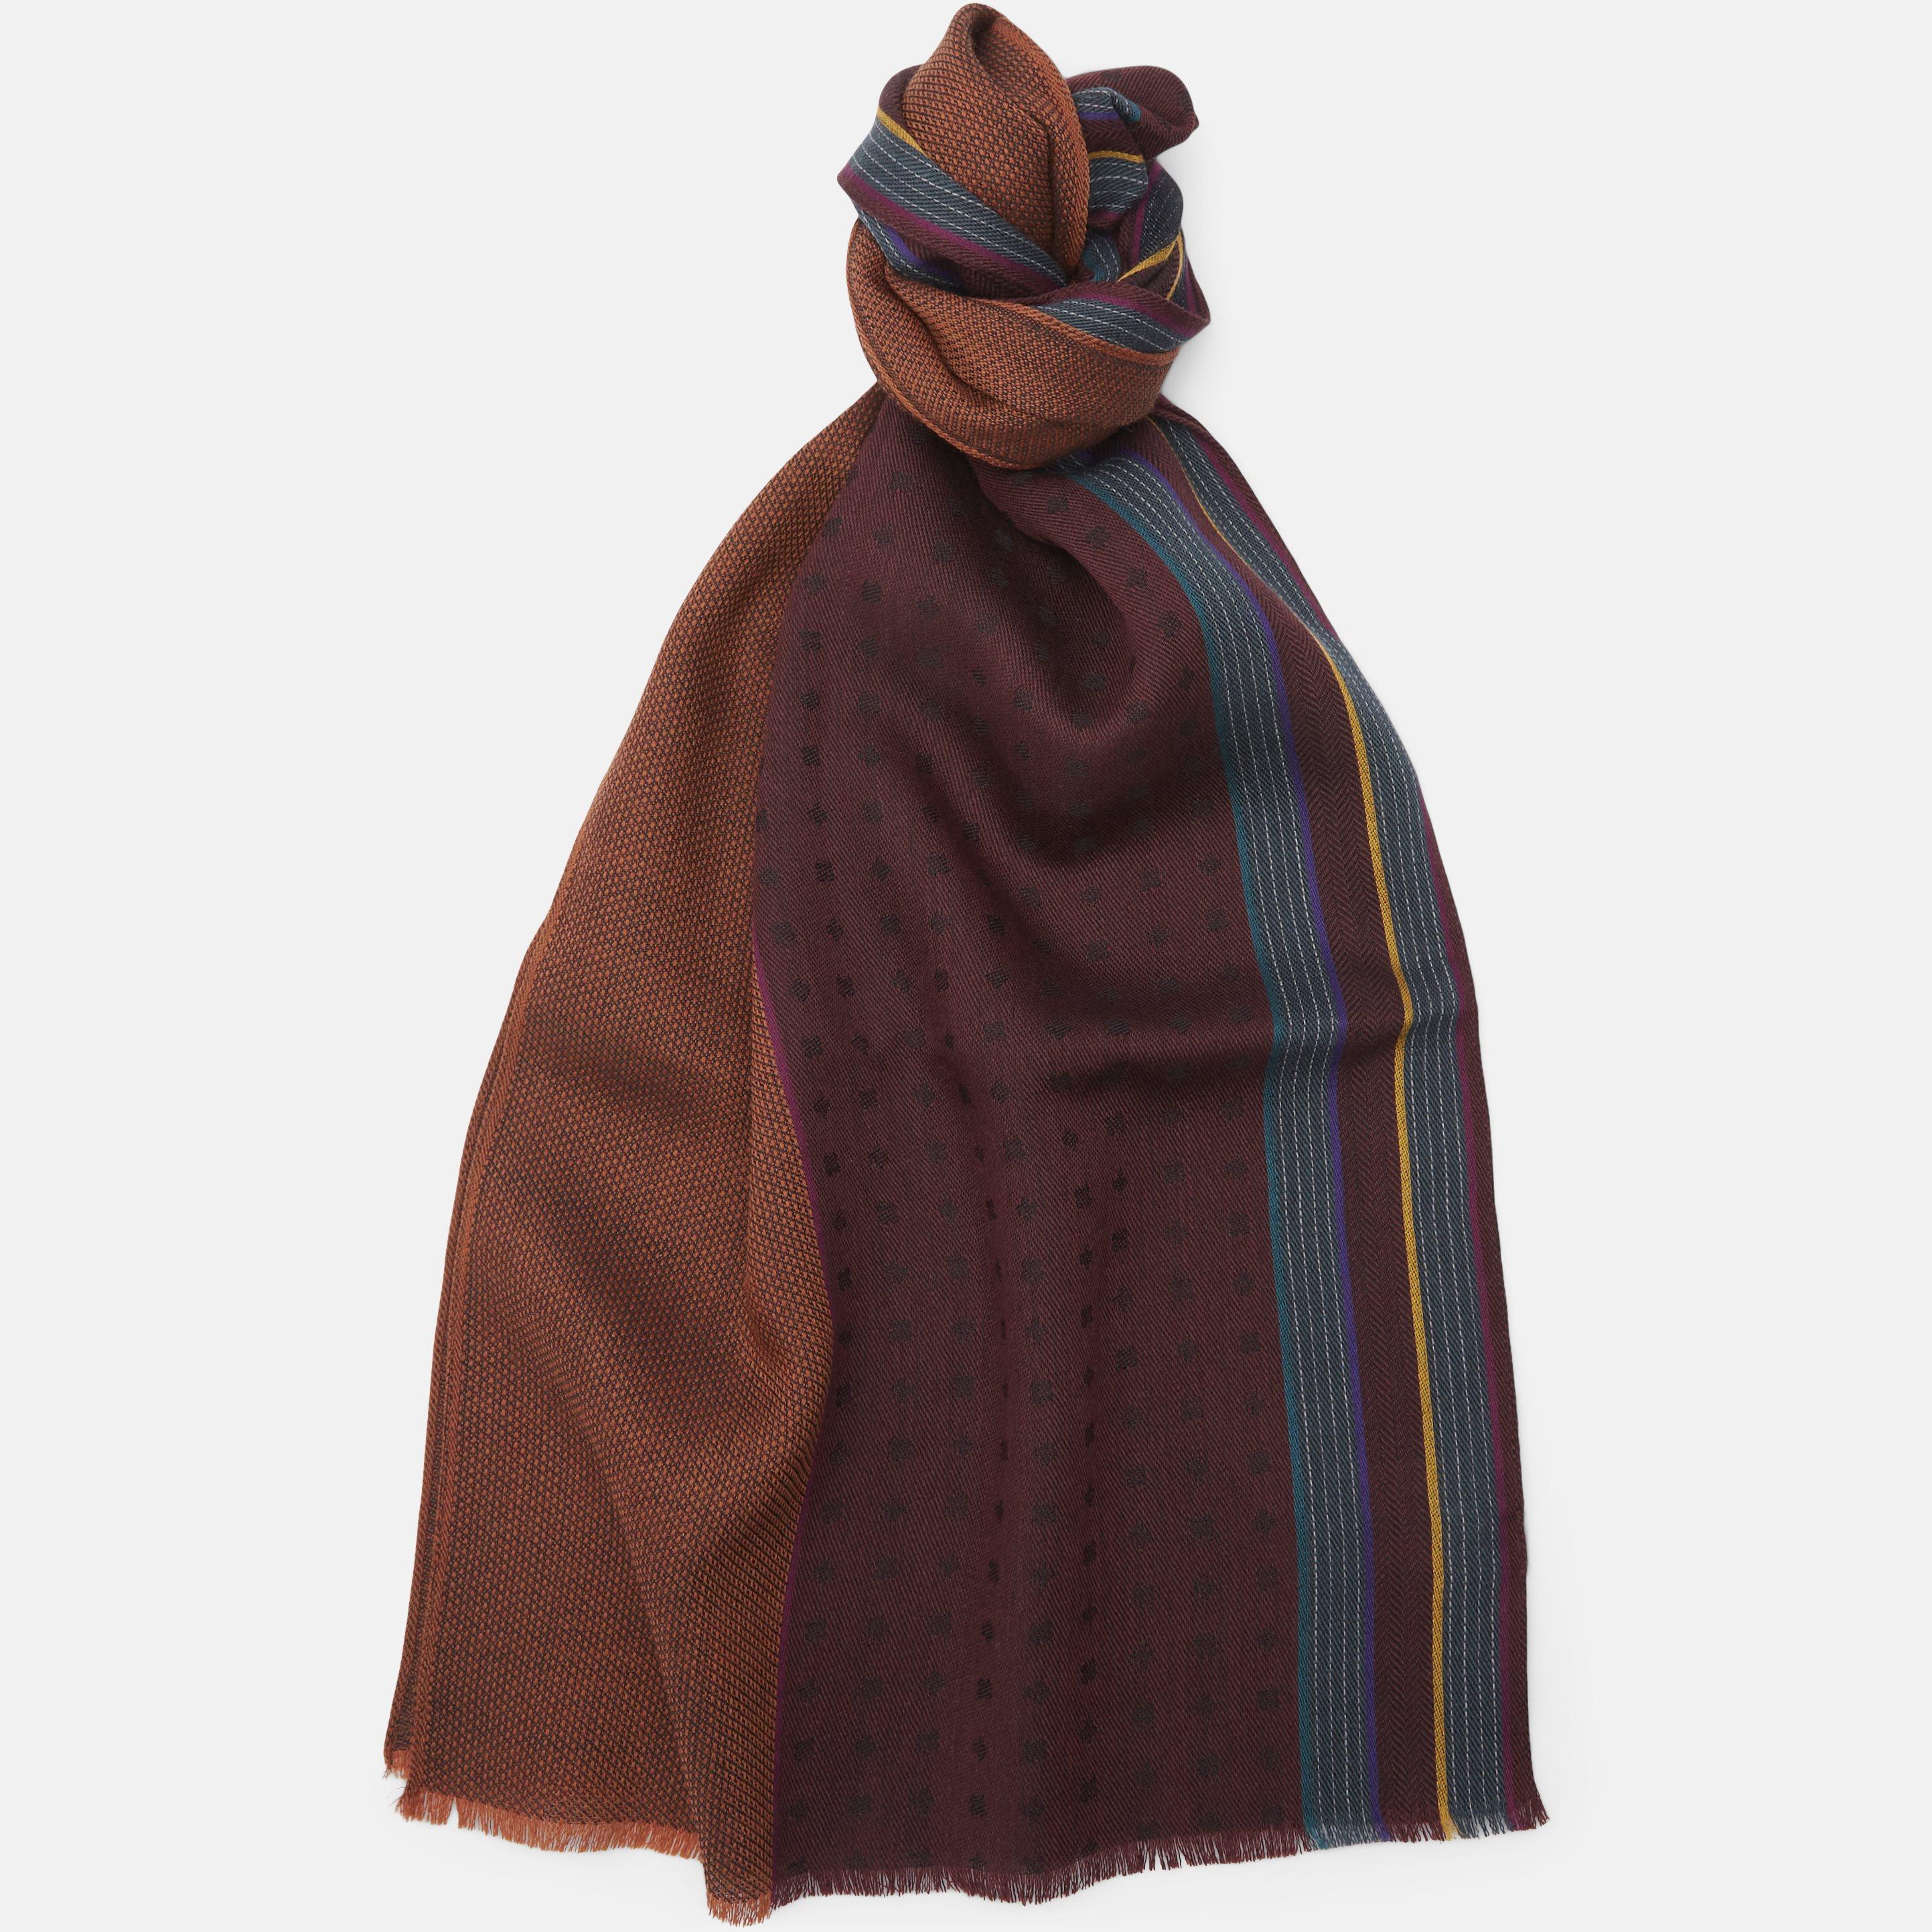 Tørklæde - Tørklæder - Brun